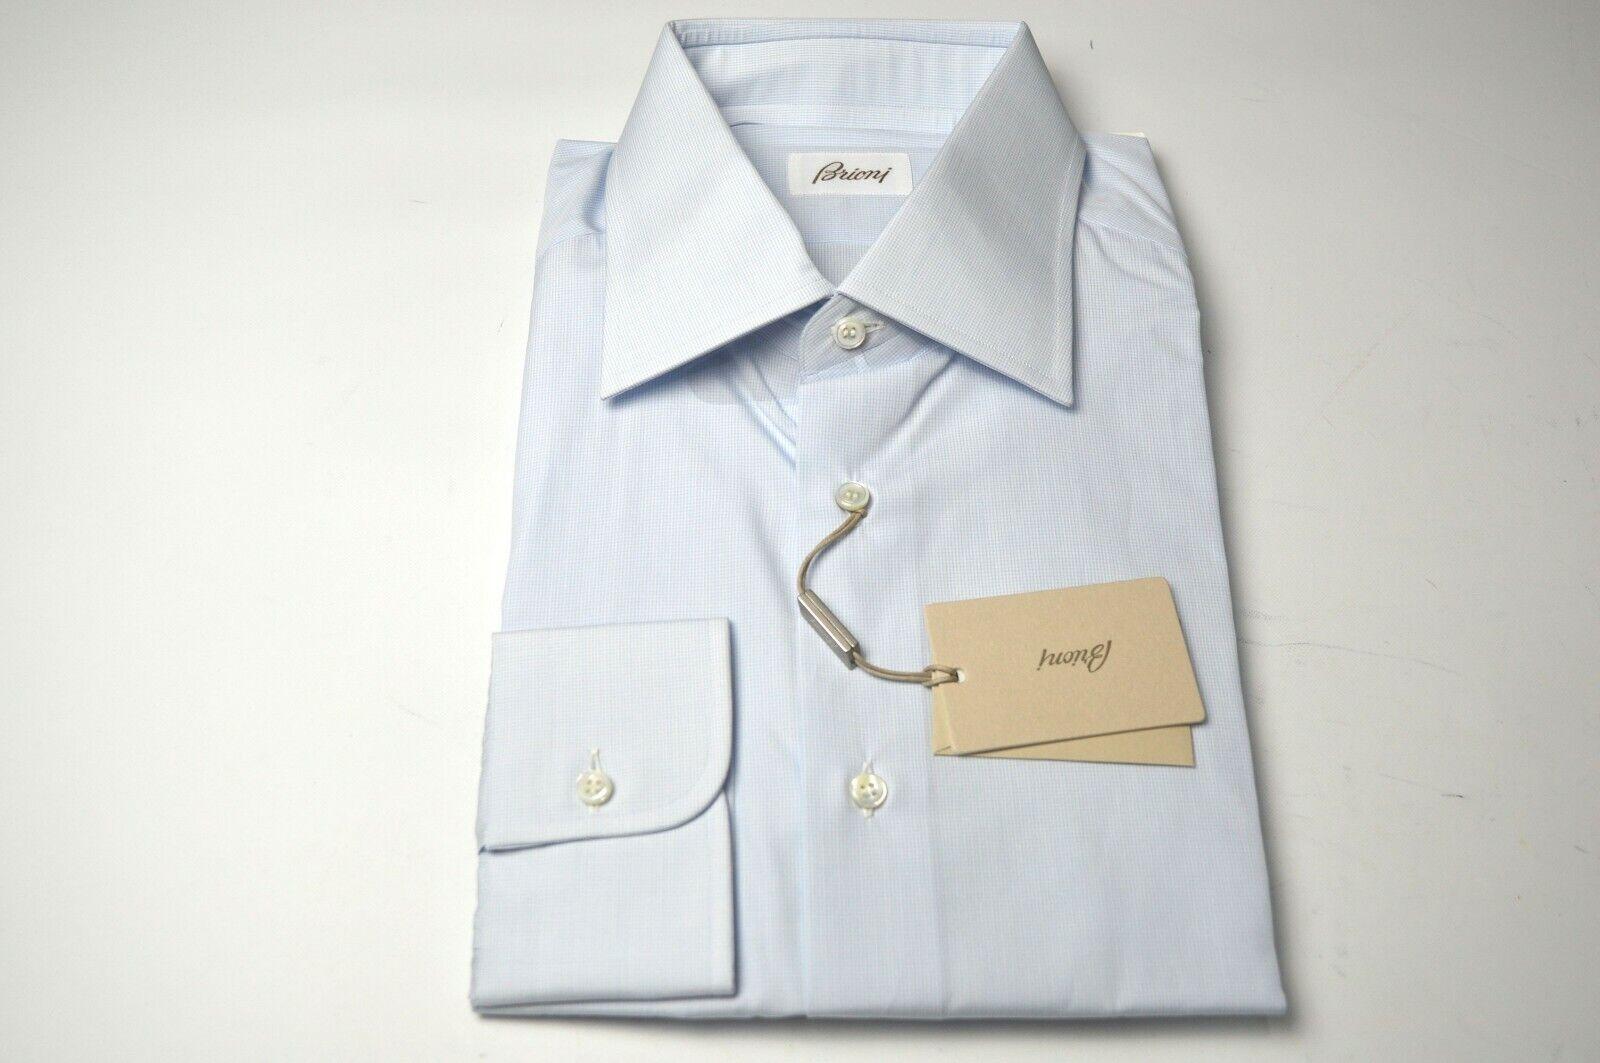 NEW  BRIONI Dress  hemd 100% baumwolle Größe 17 Us 43 Eu  (ARA233)